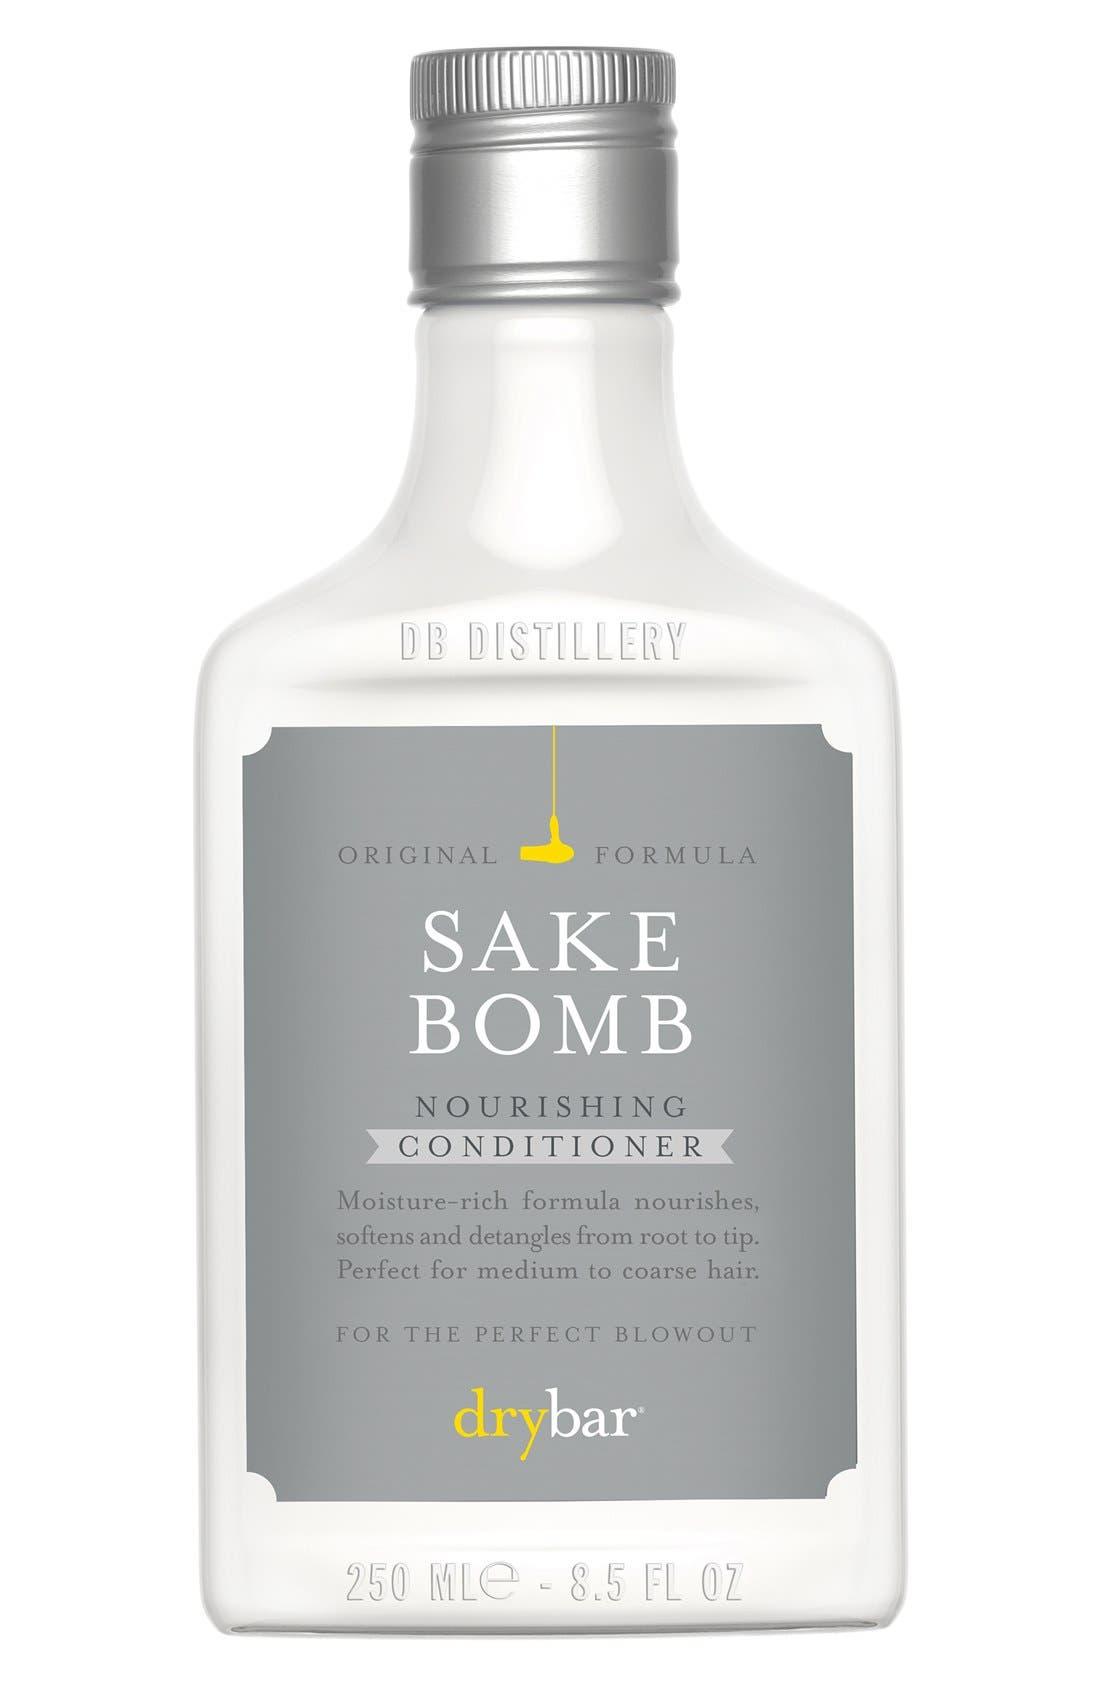 DRYBAR, Sake Bomb Nourishing Conditioner, Alternate thumbnail 2, color, NO COLOR